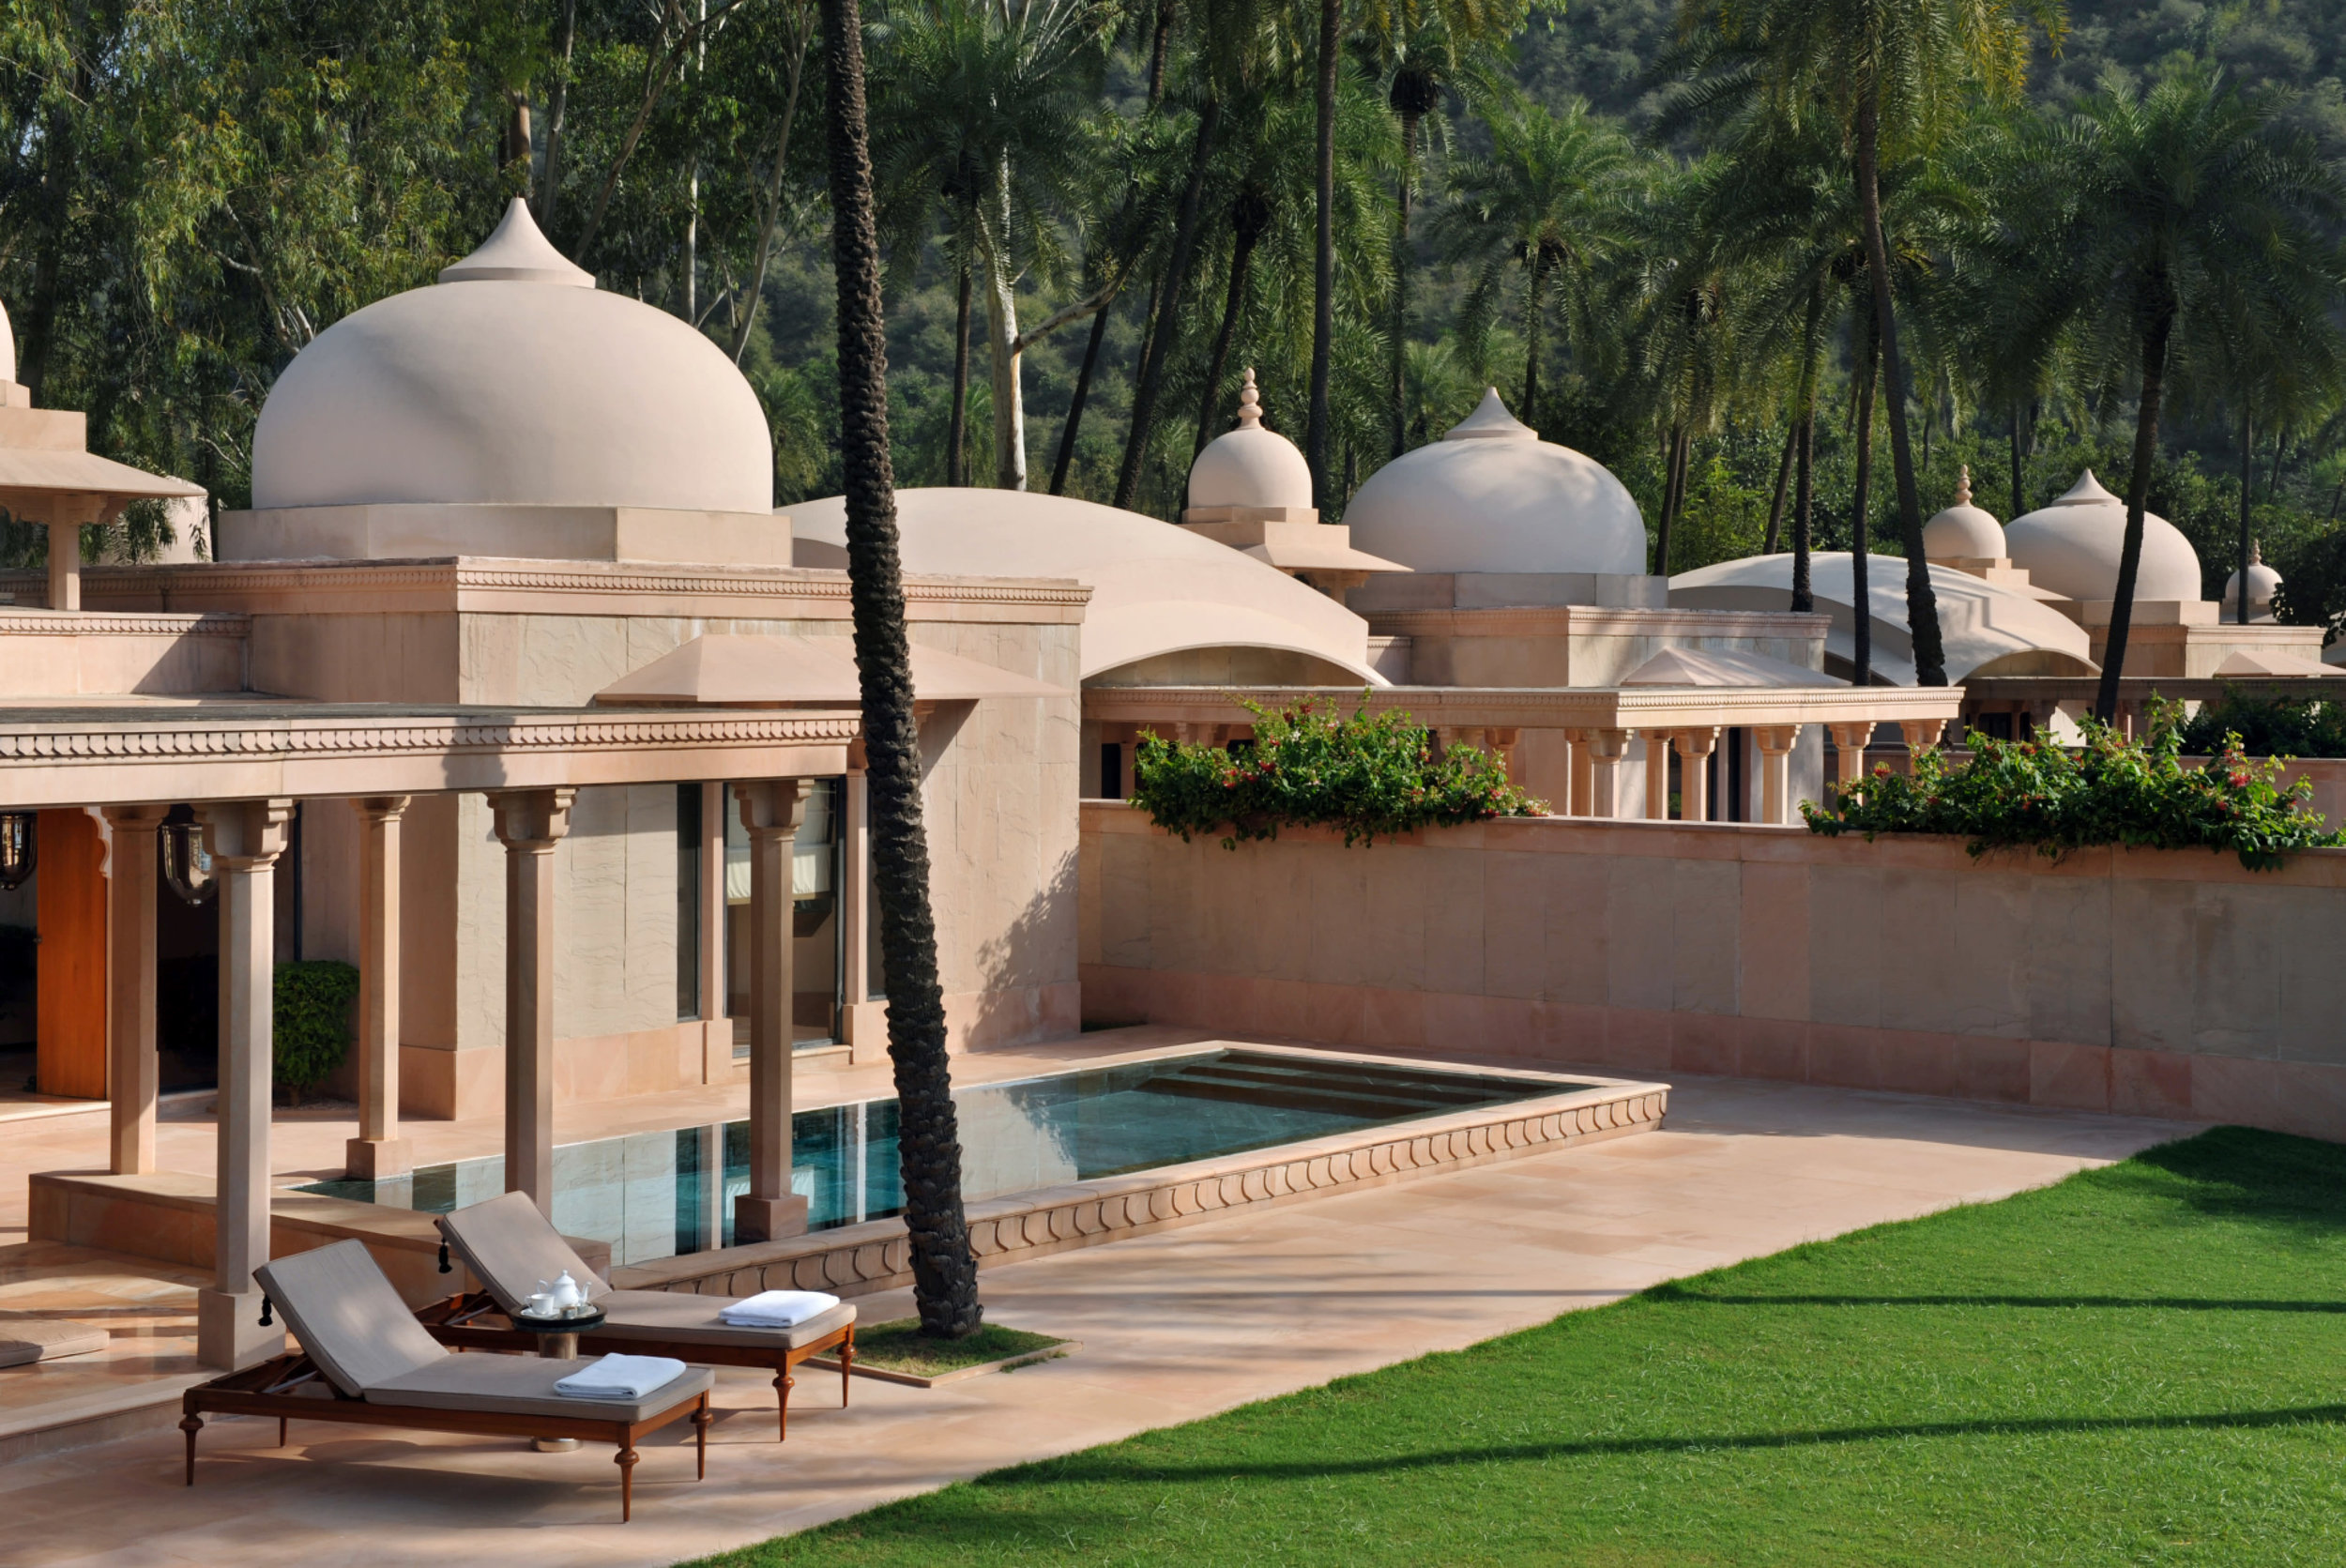 pool_pavilion_terrace_office_1727_0.jpg